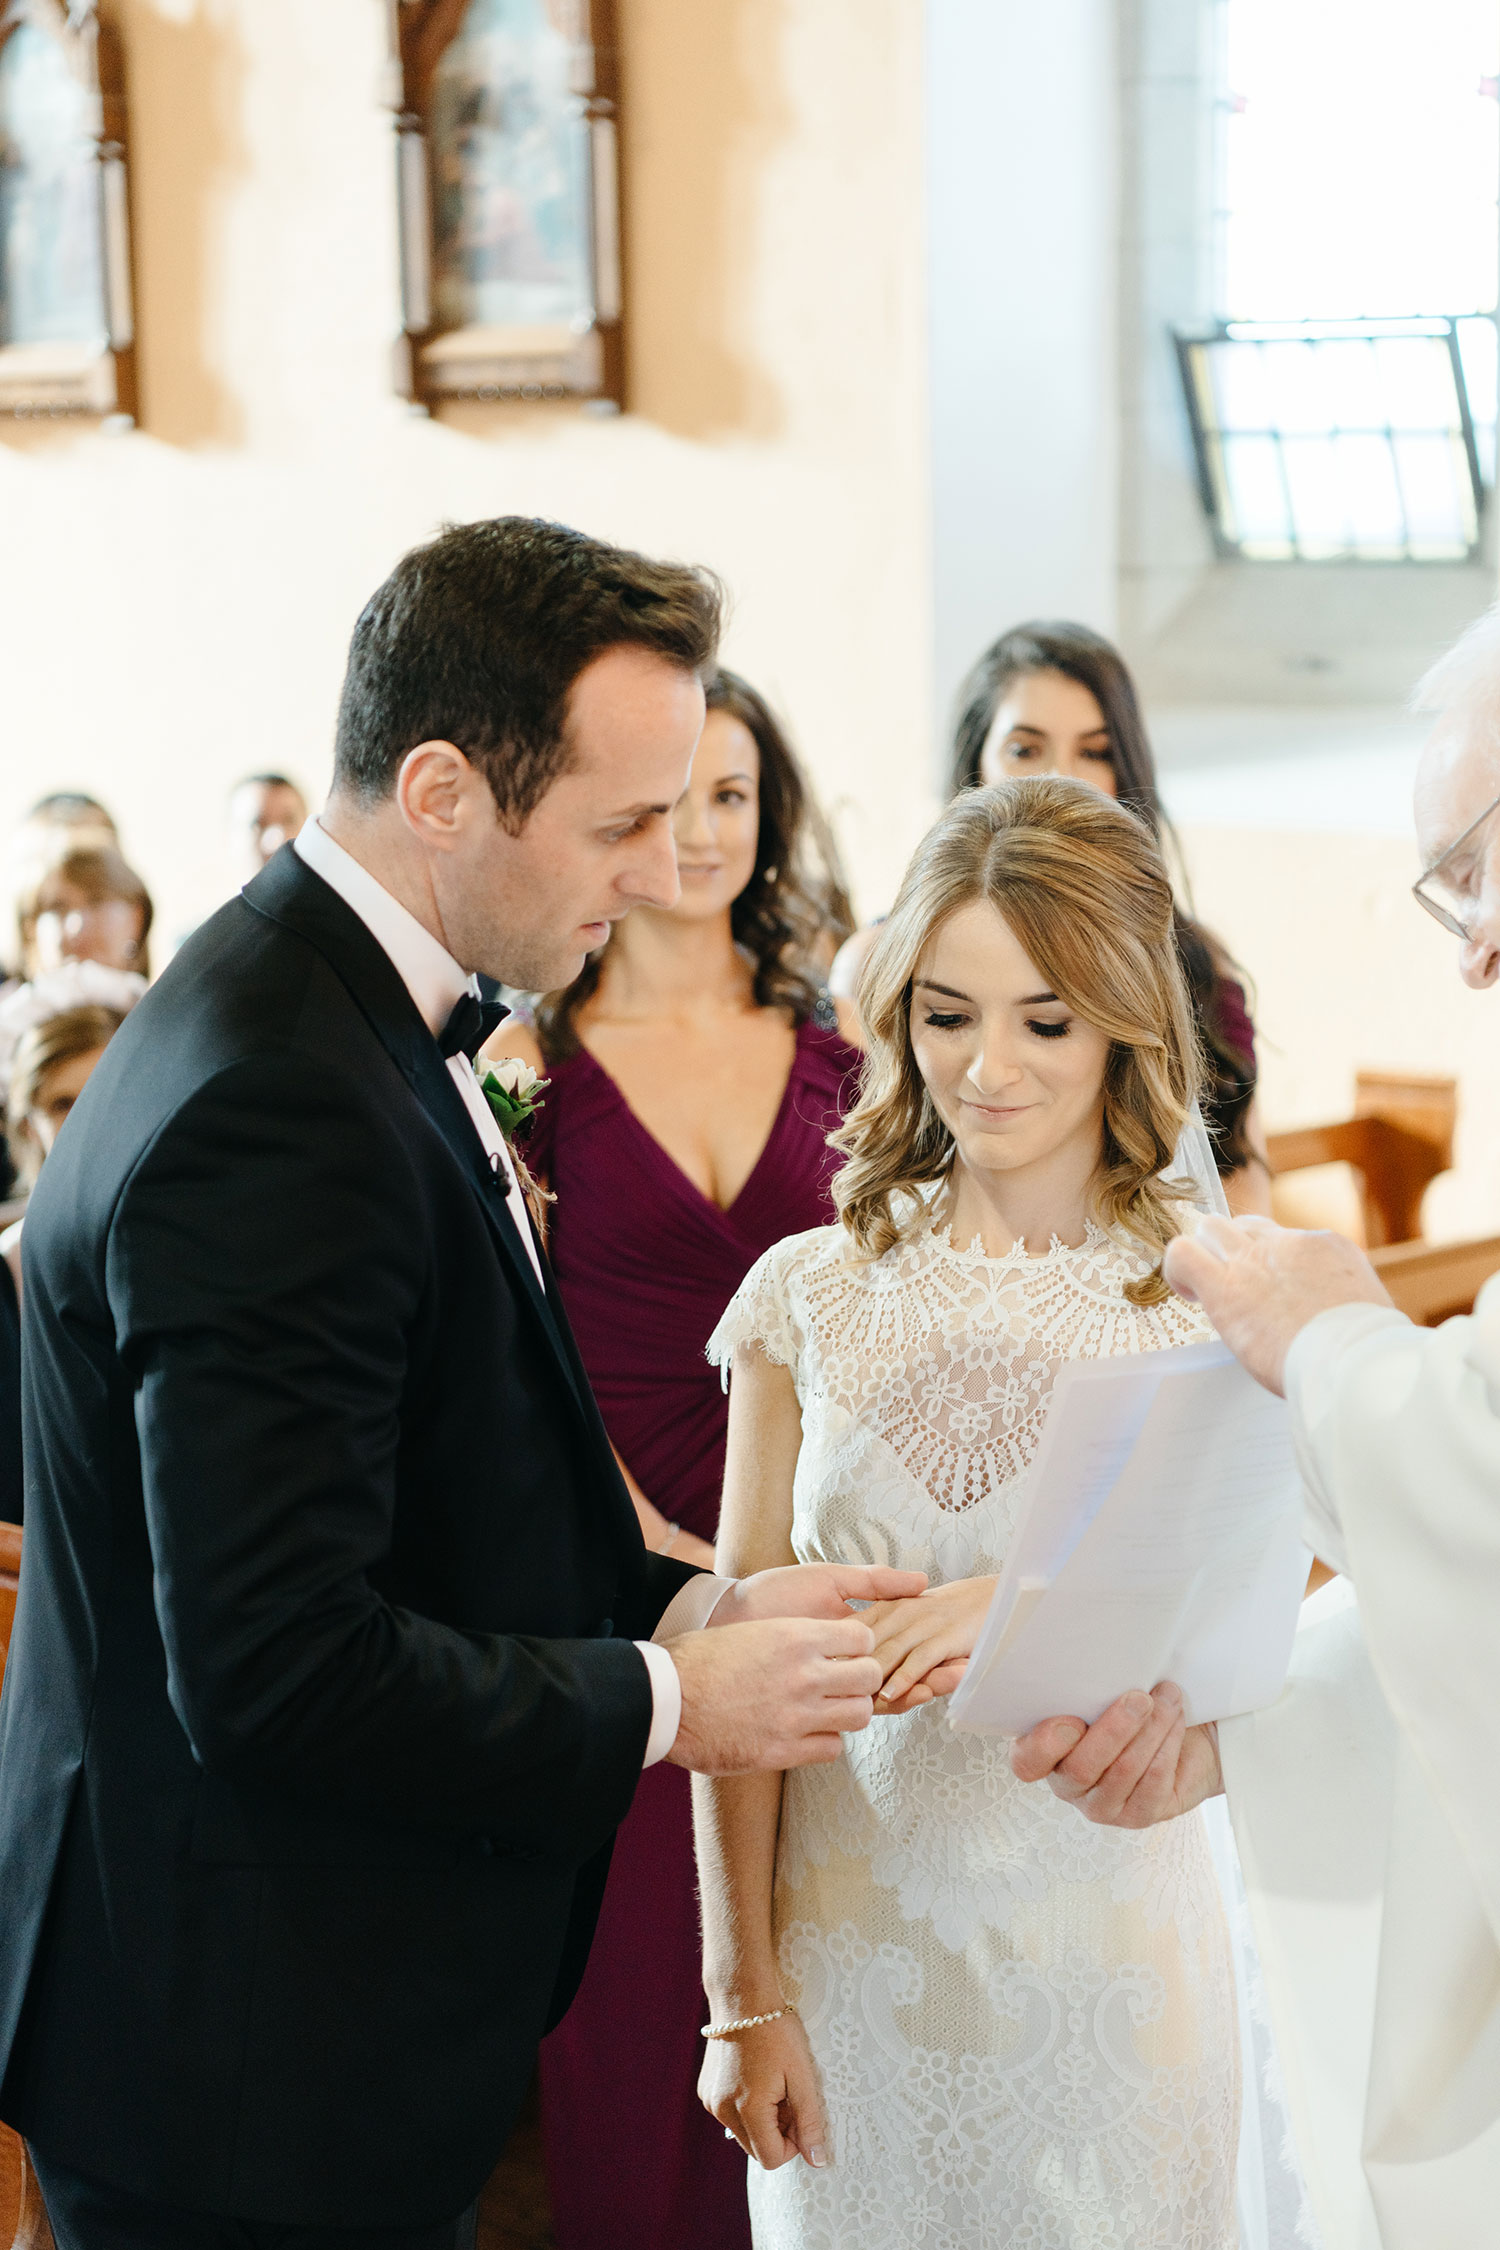 bellinter-house-wedding-photographer-0054_0054.jpg